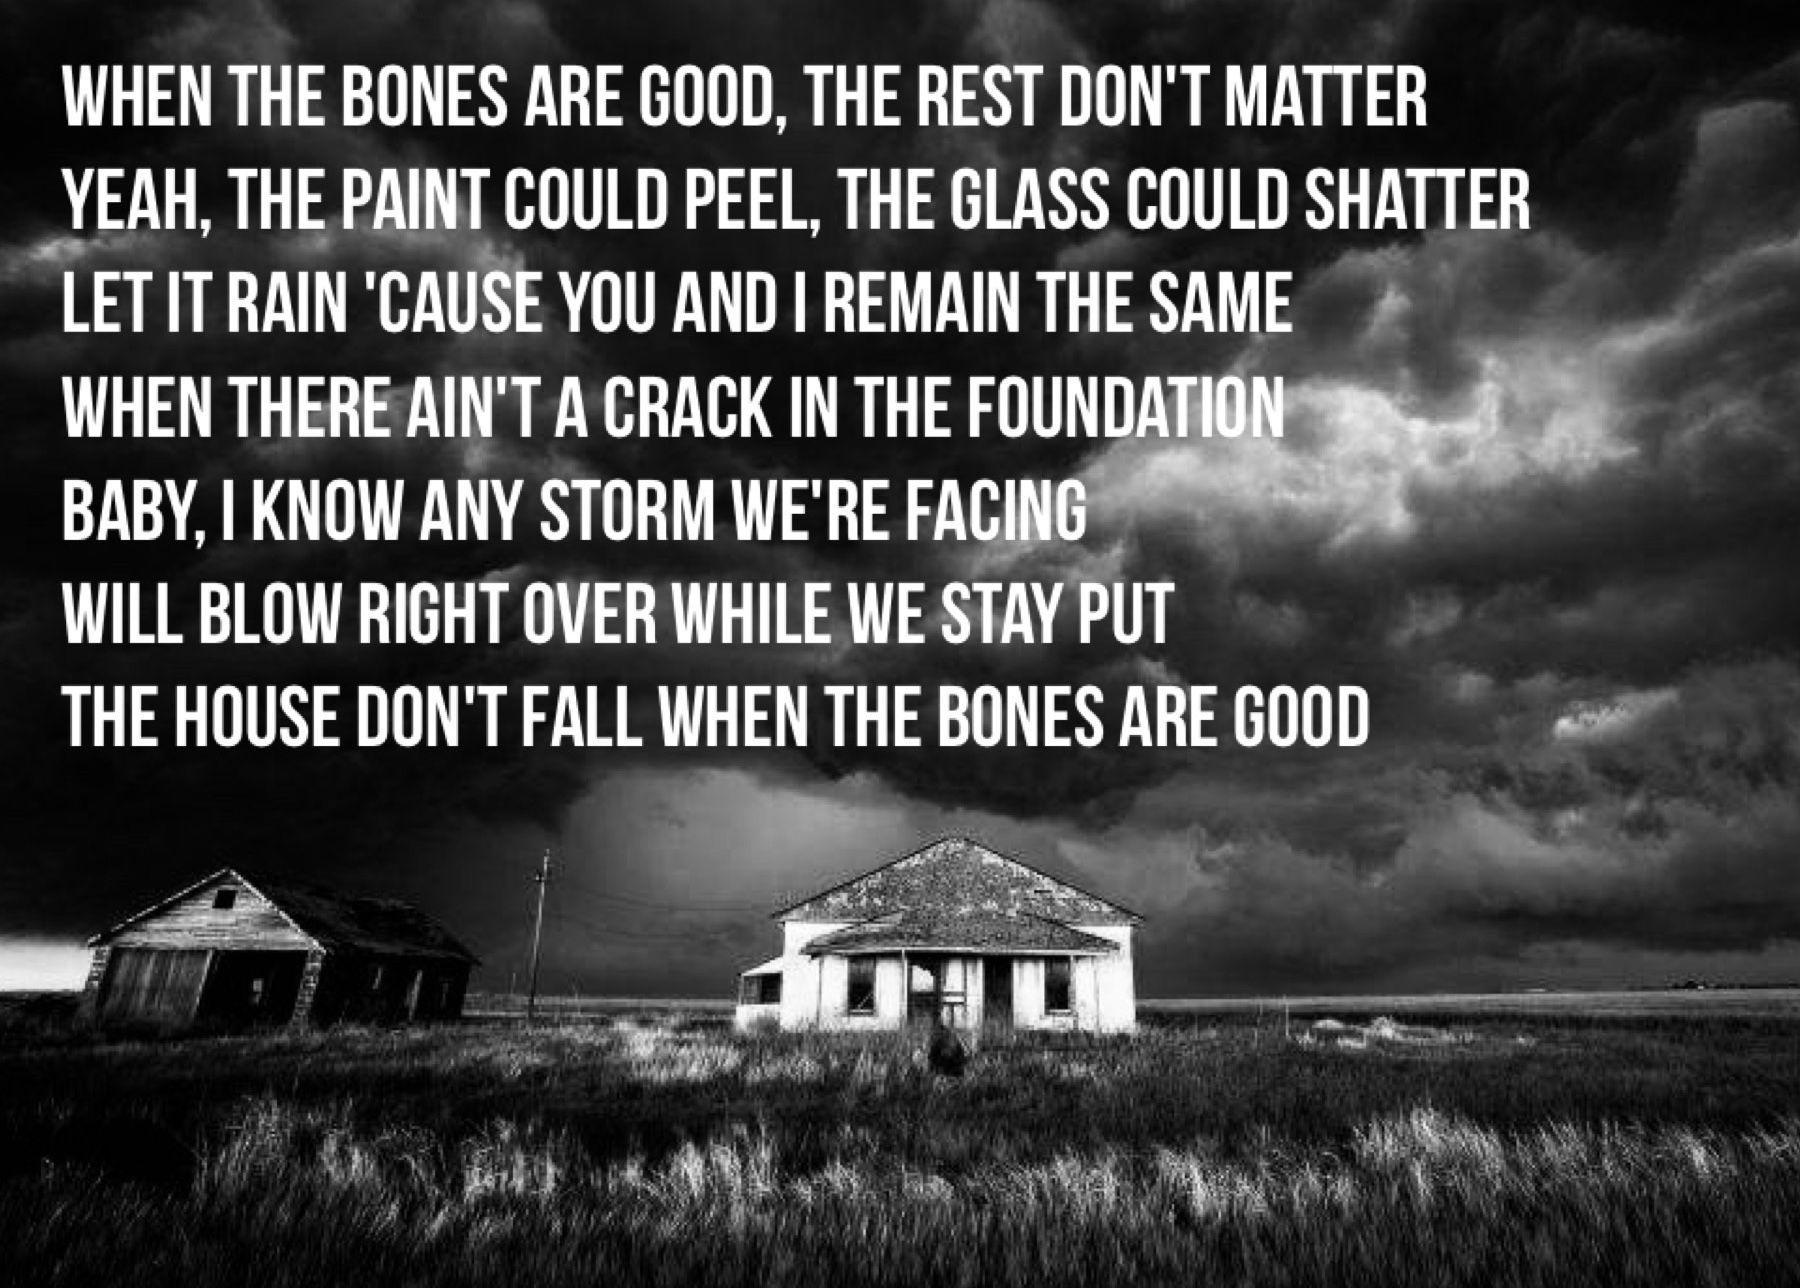 The Bones Maren Morris With Images Maren Morris Lyrics